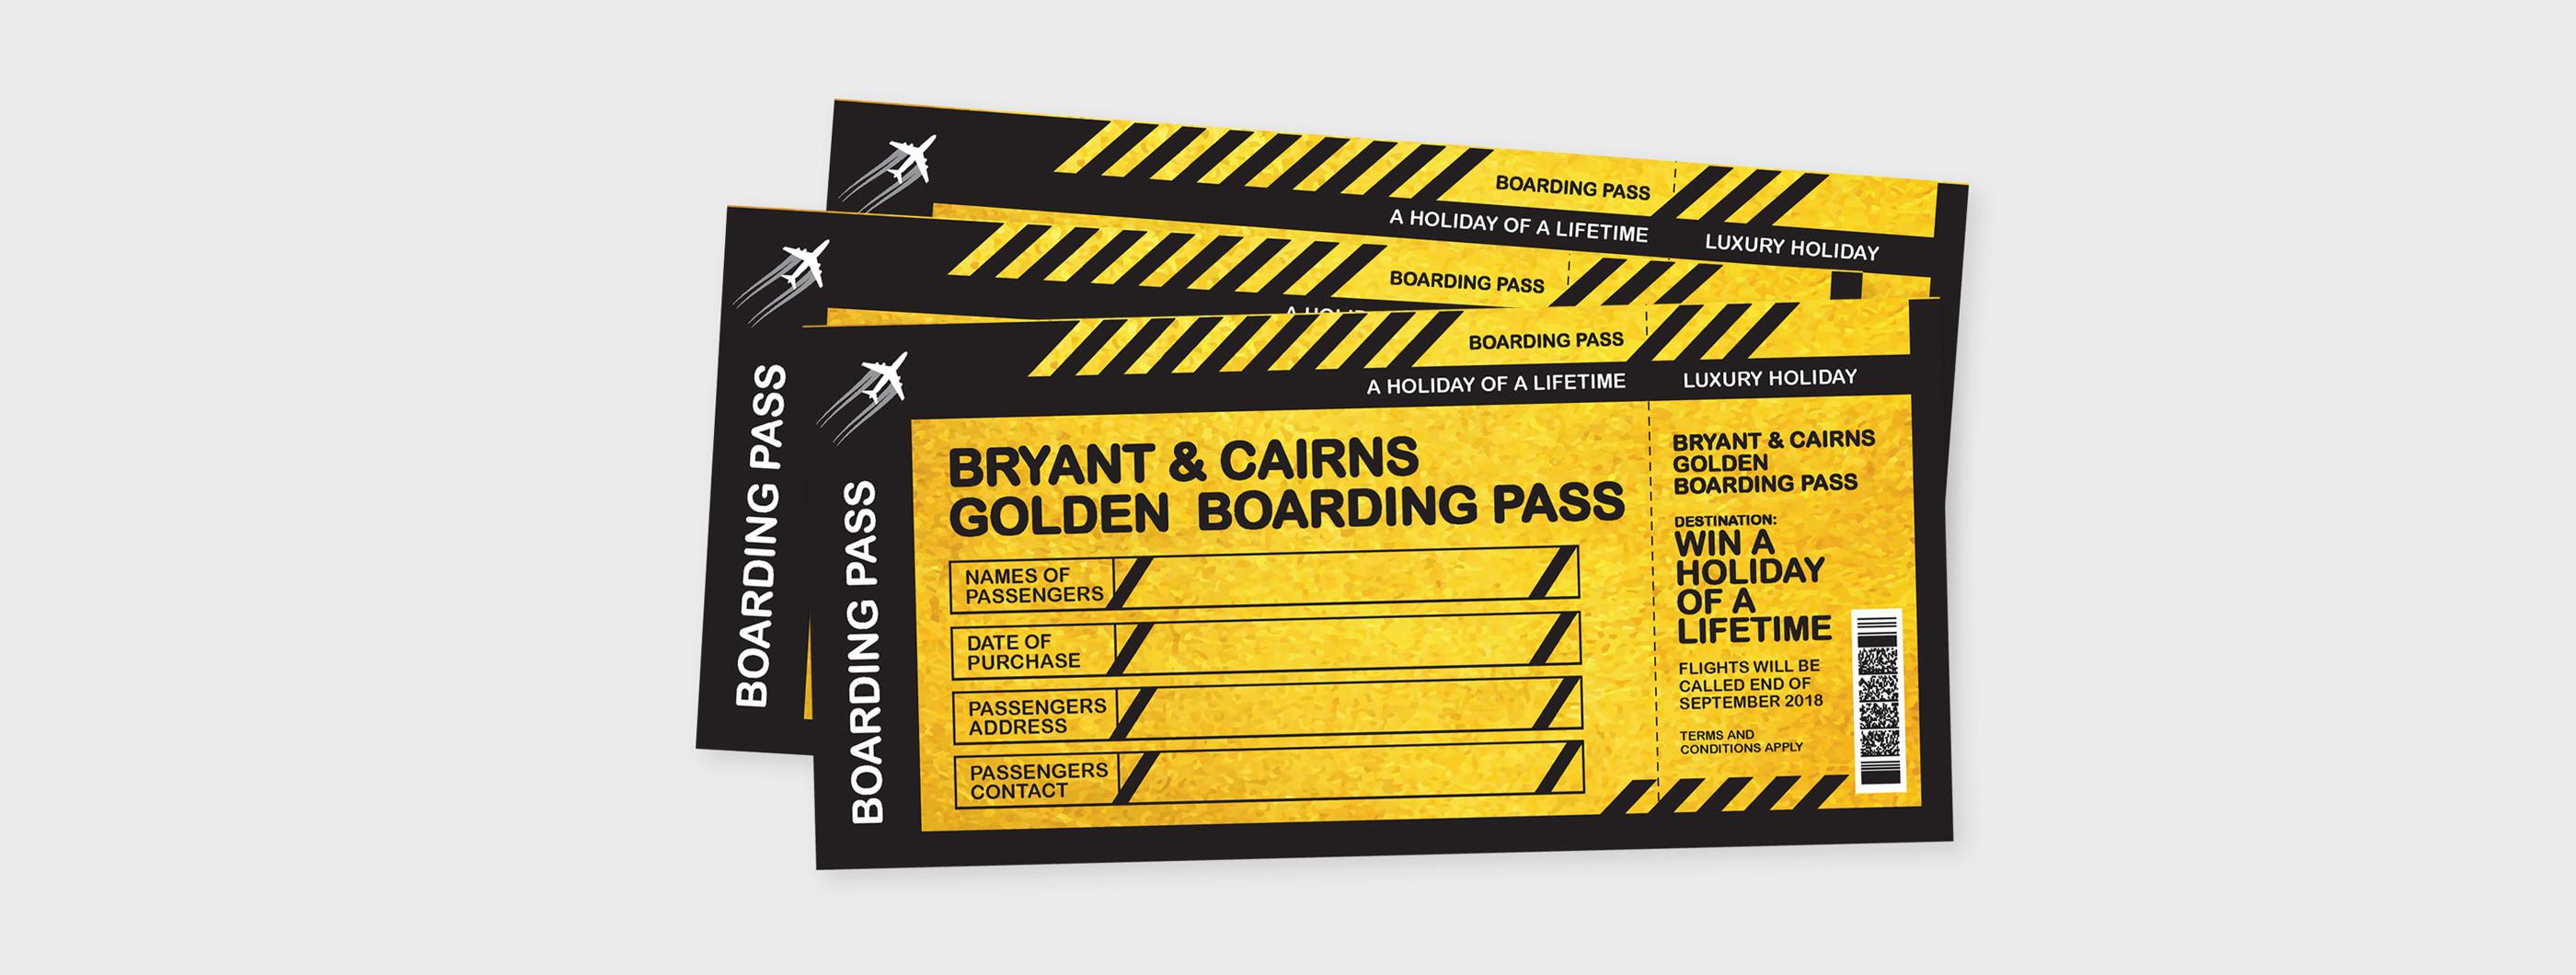 Bryant & Cairns